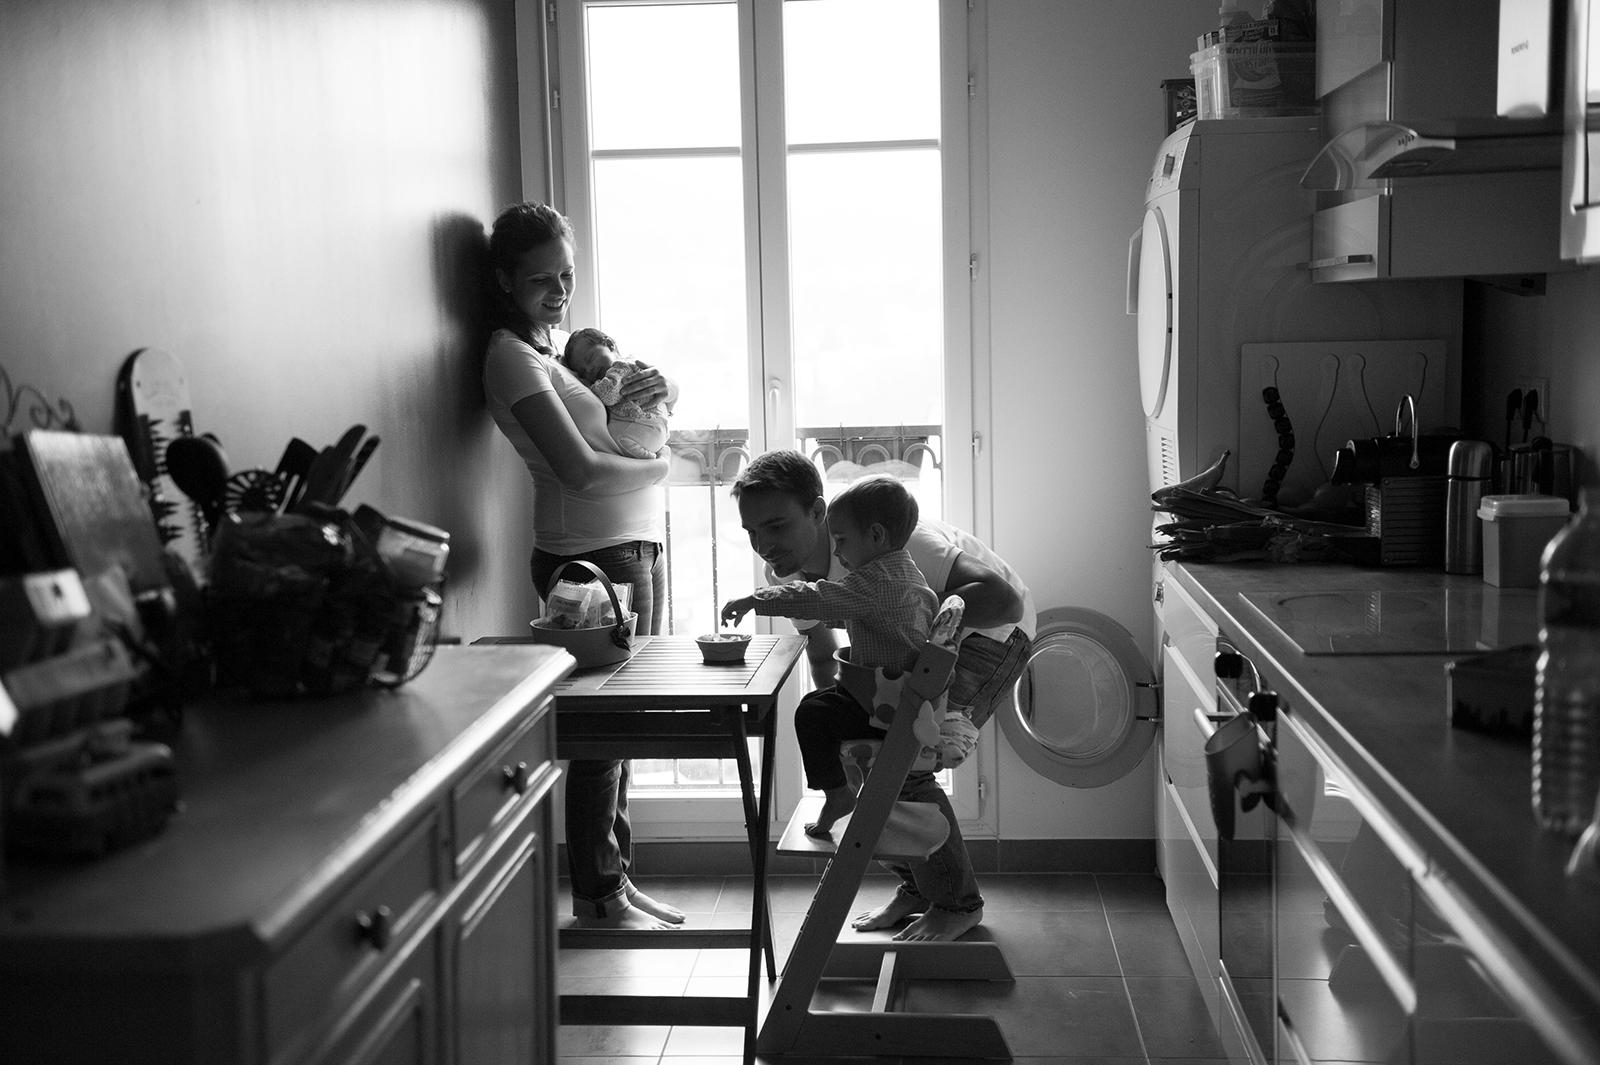 seance-photo-famille-photo-grossesse-photo-bébé-naissance-sabrina-godemert-photographe-seine-et-marne035